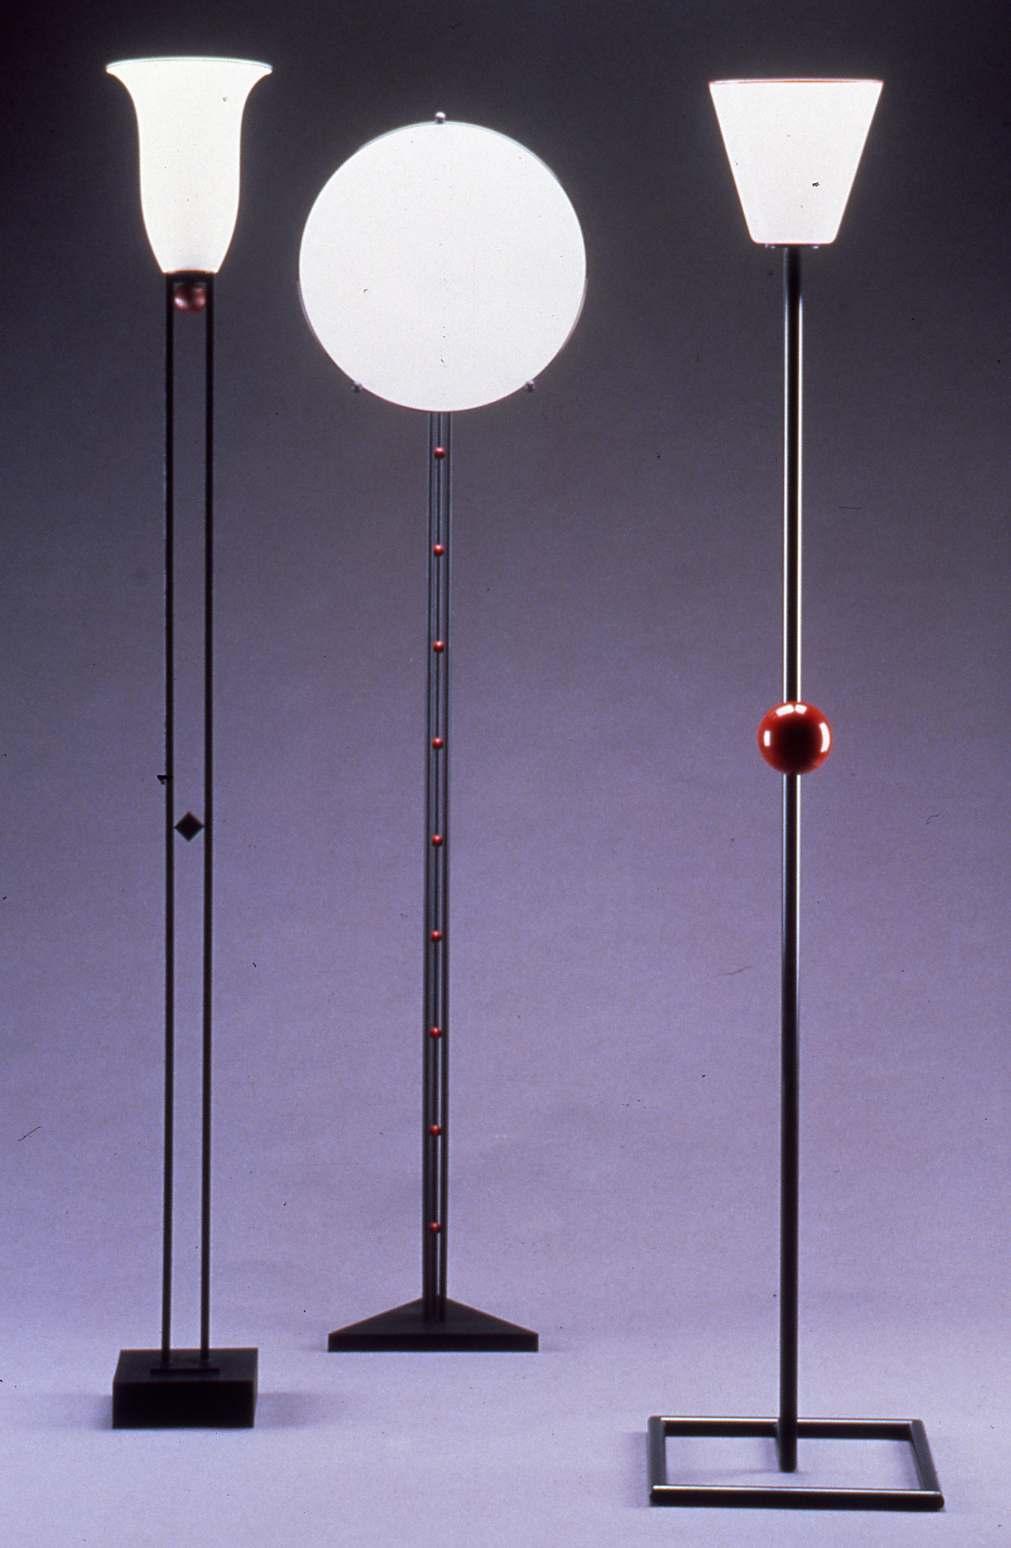 Series of handmade metal and glass floor lamps